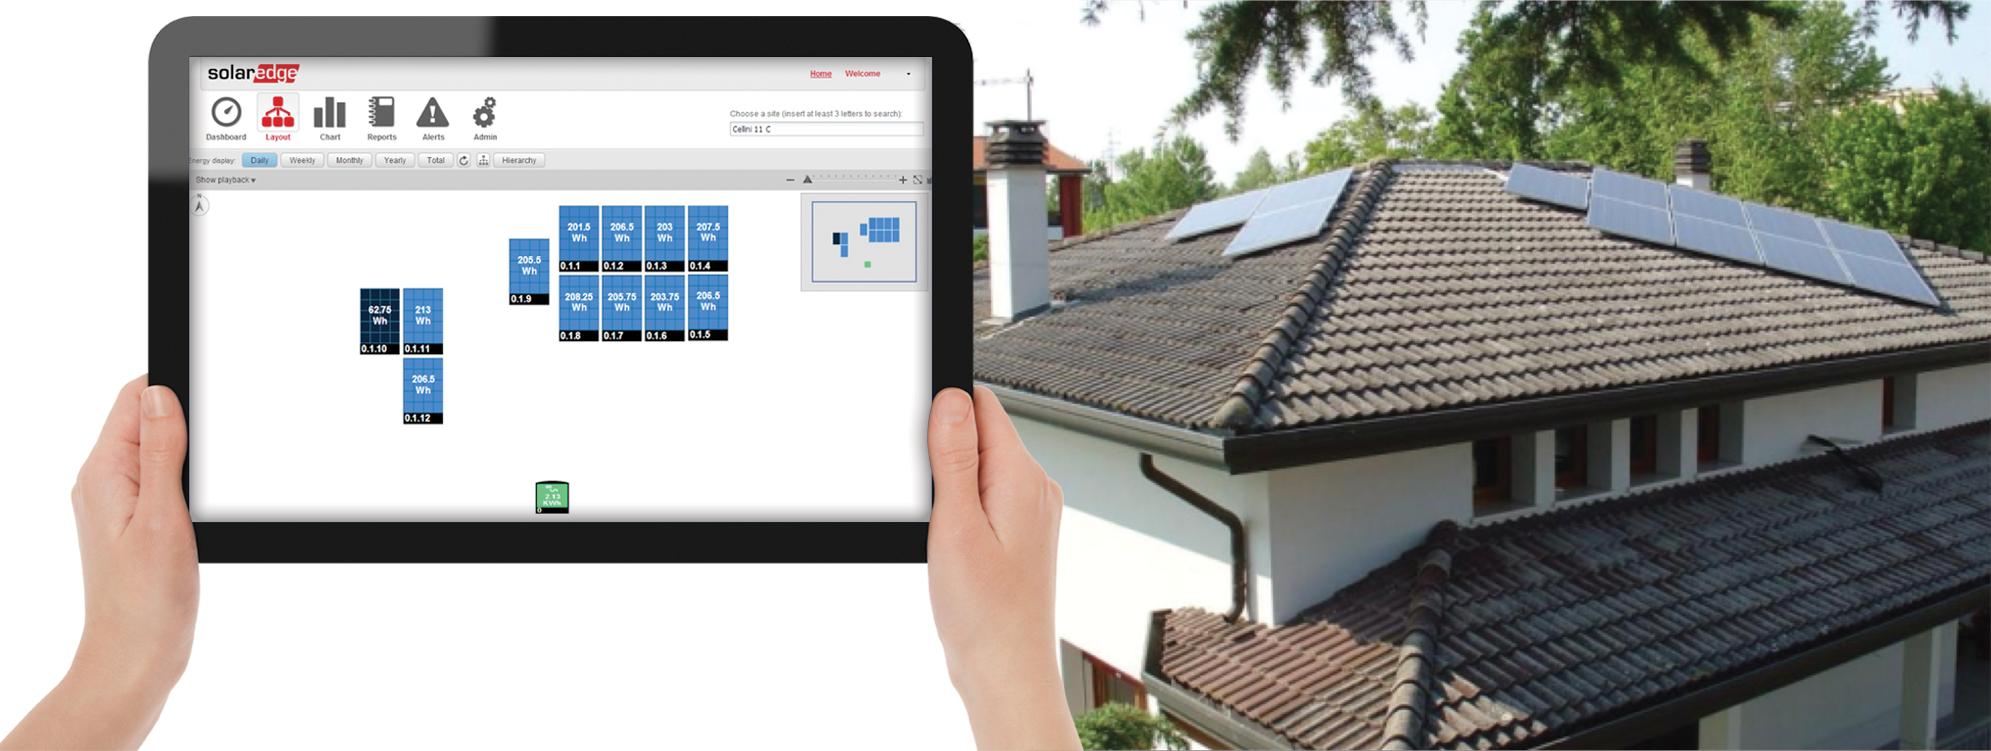 Solaredge Monitoring System Superior Solar